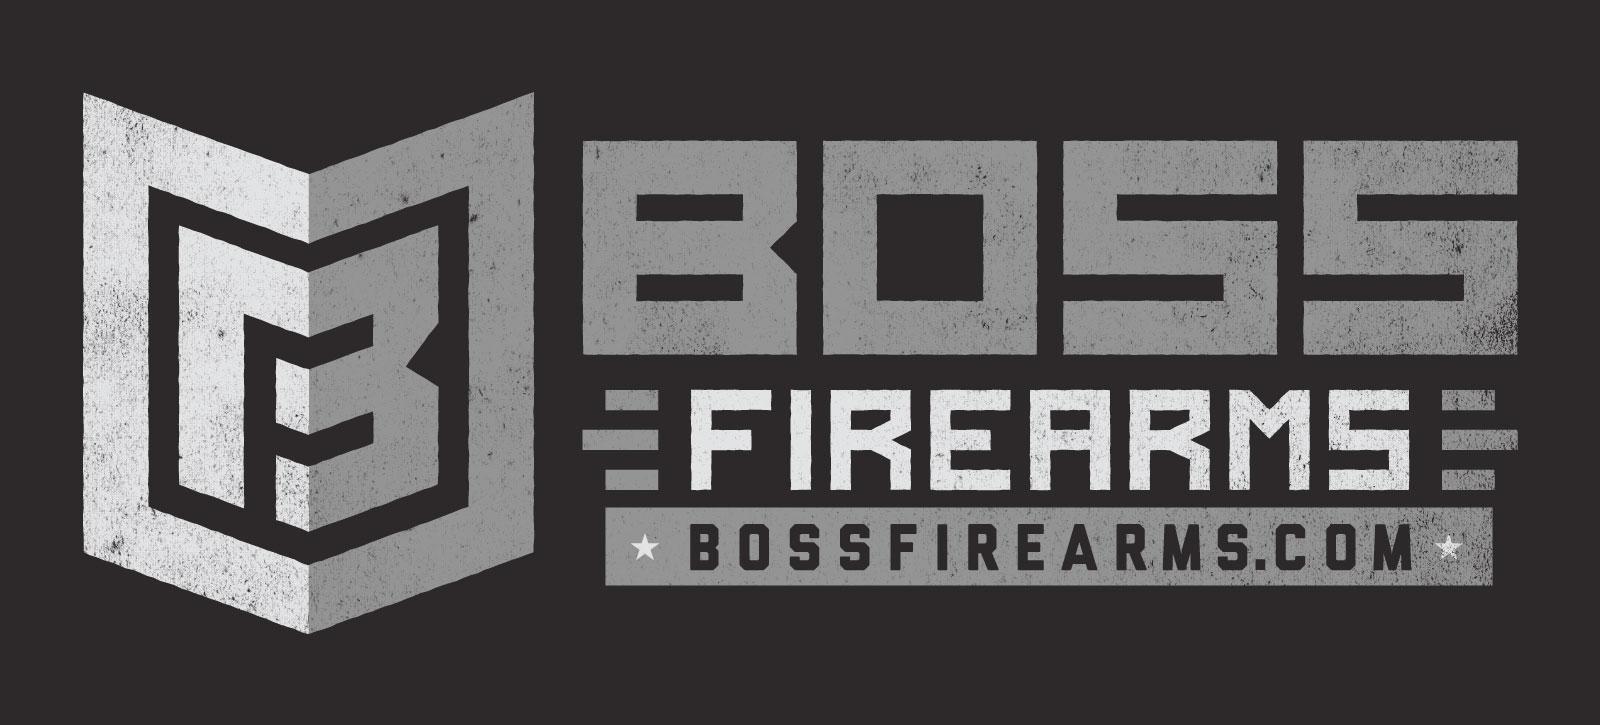 Boss Firearms Company